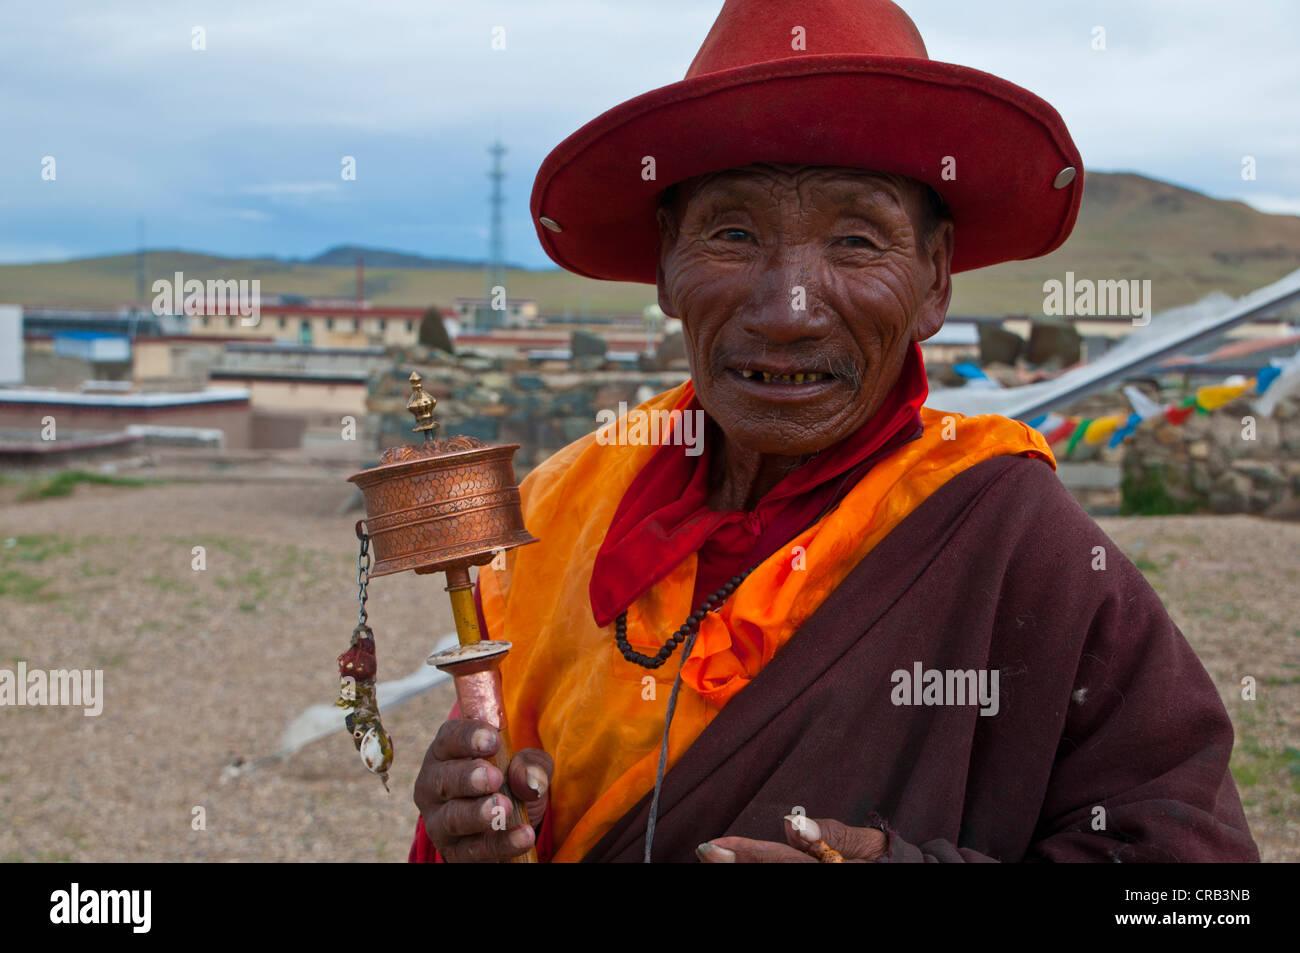 Elderly monk in the town of Tsochen, Western Tibet, Tibet, Asia - Stock Image